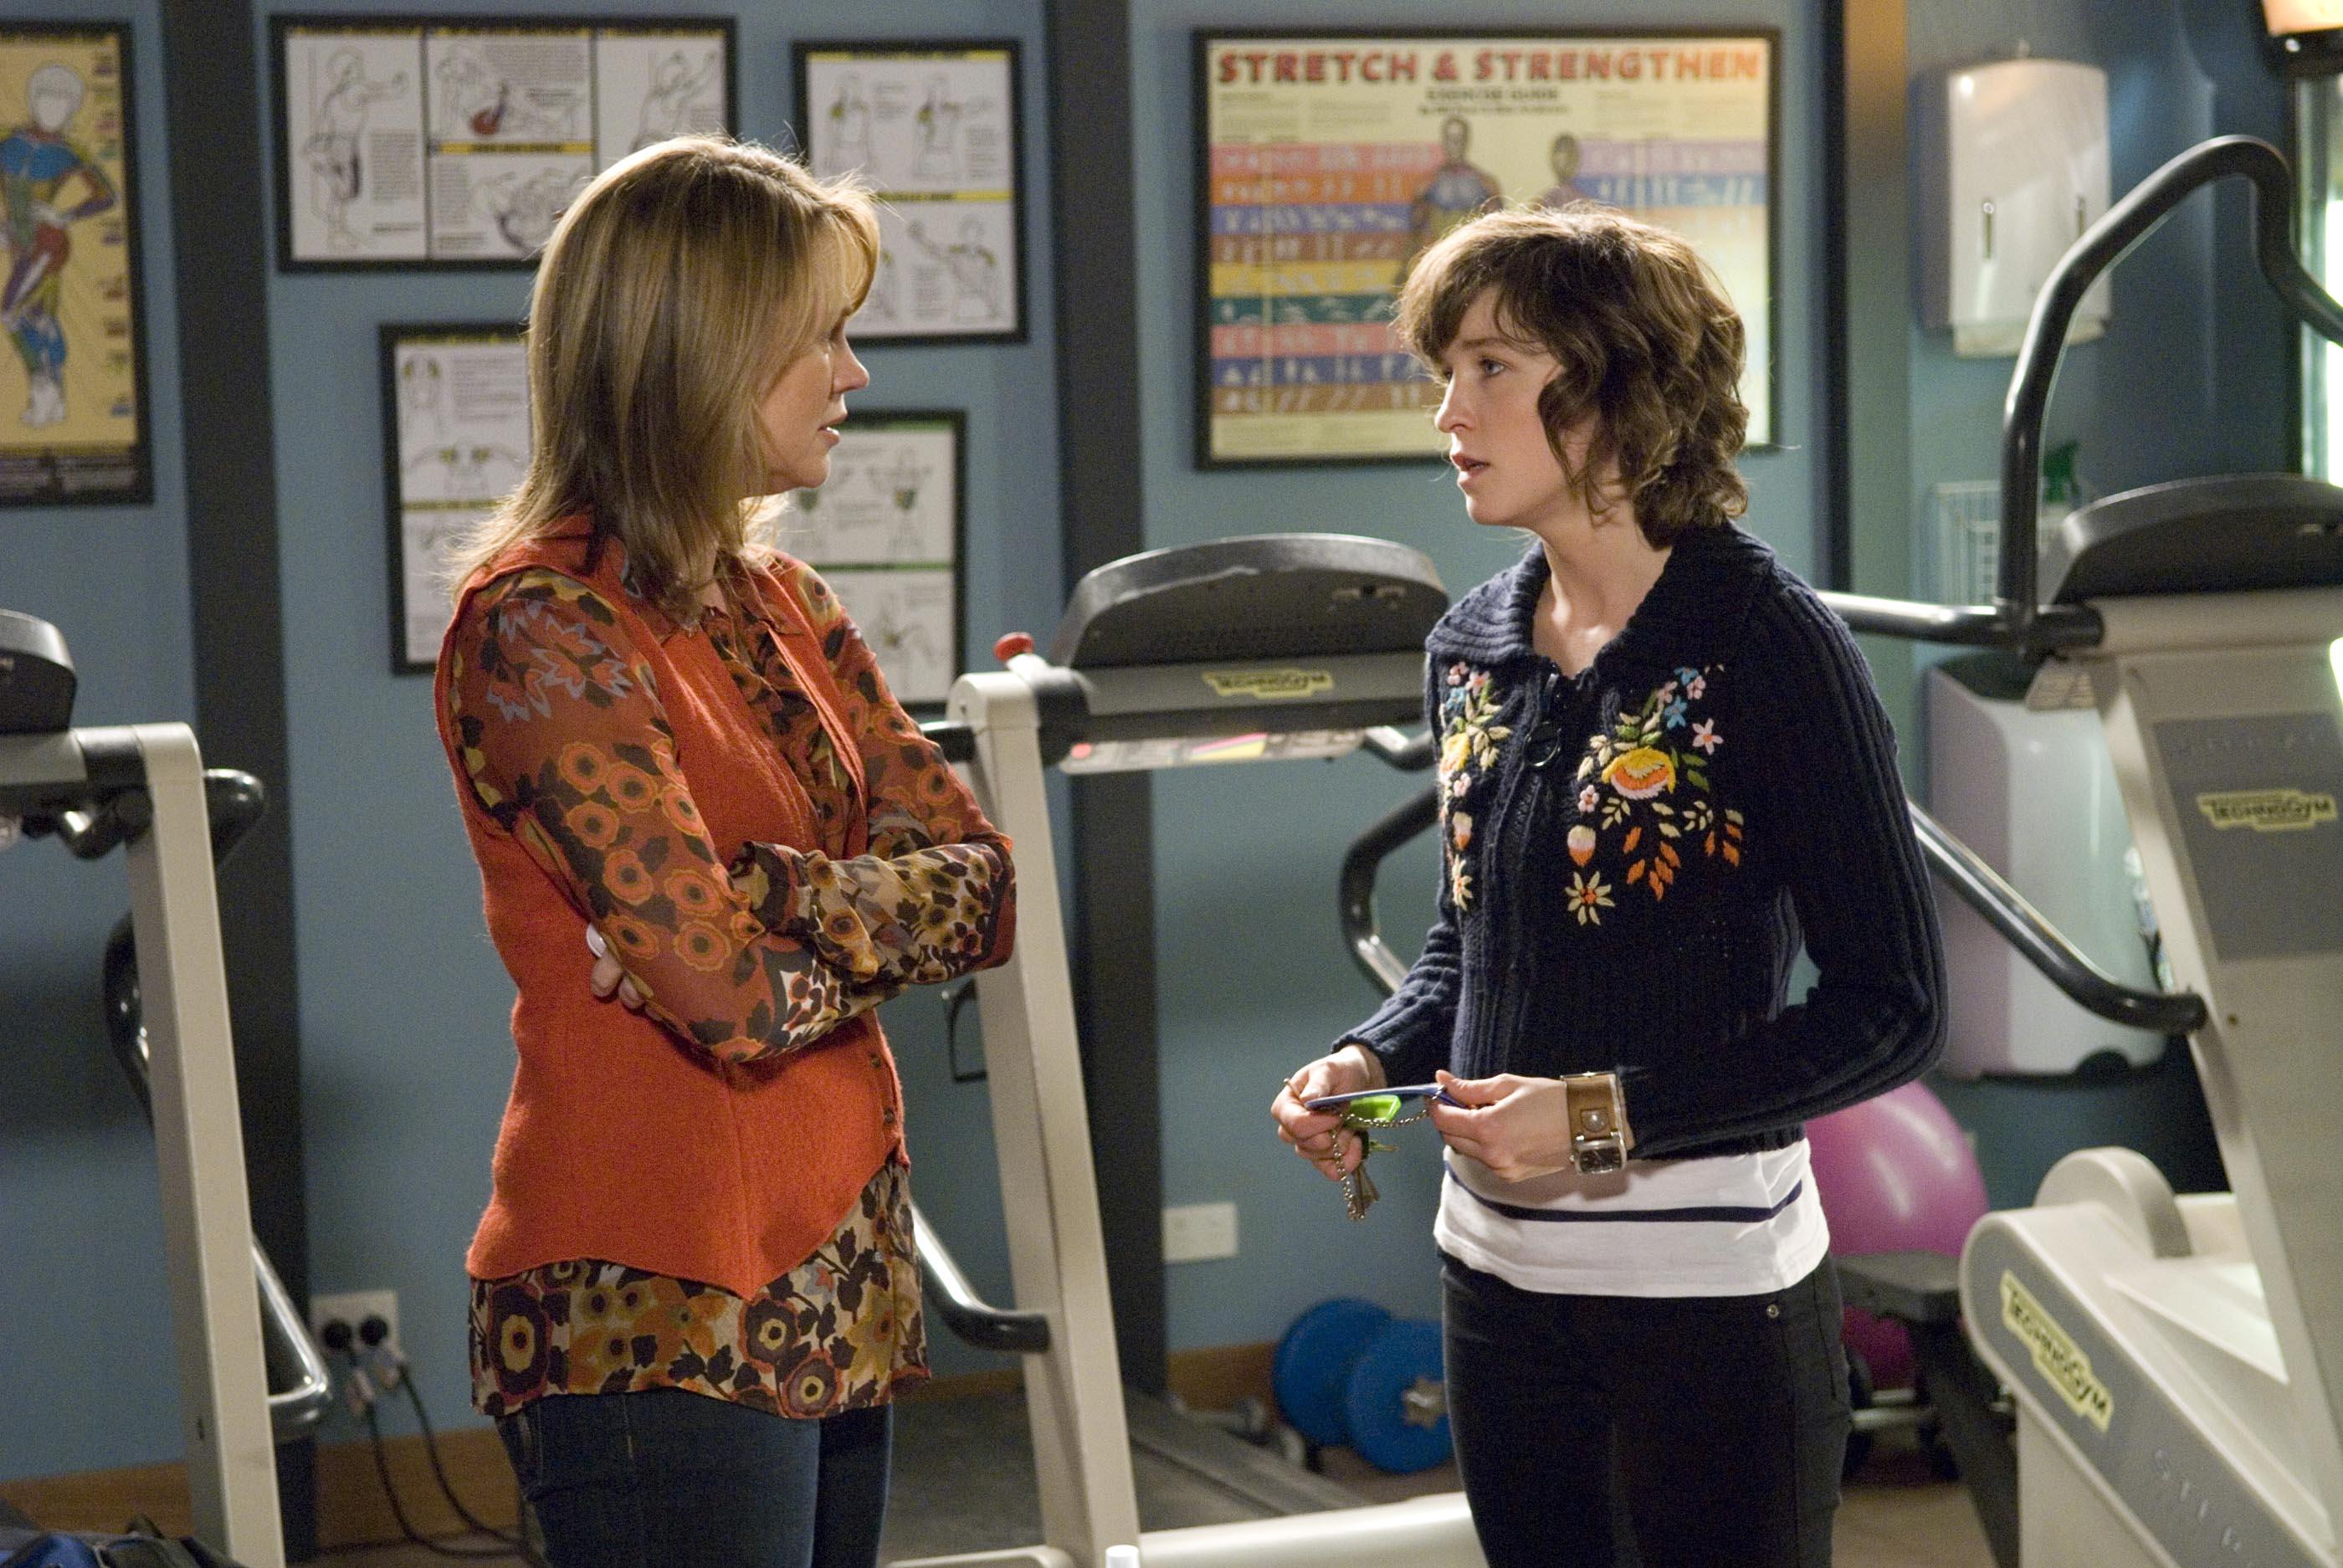 Miranda and Bridget fear for missing Steve